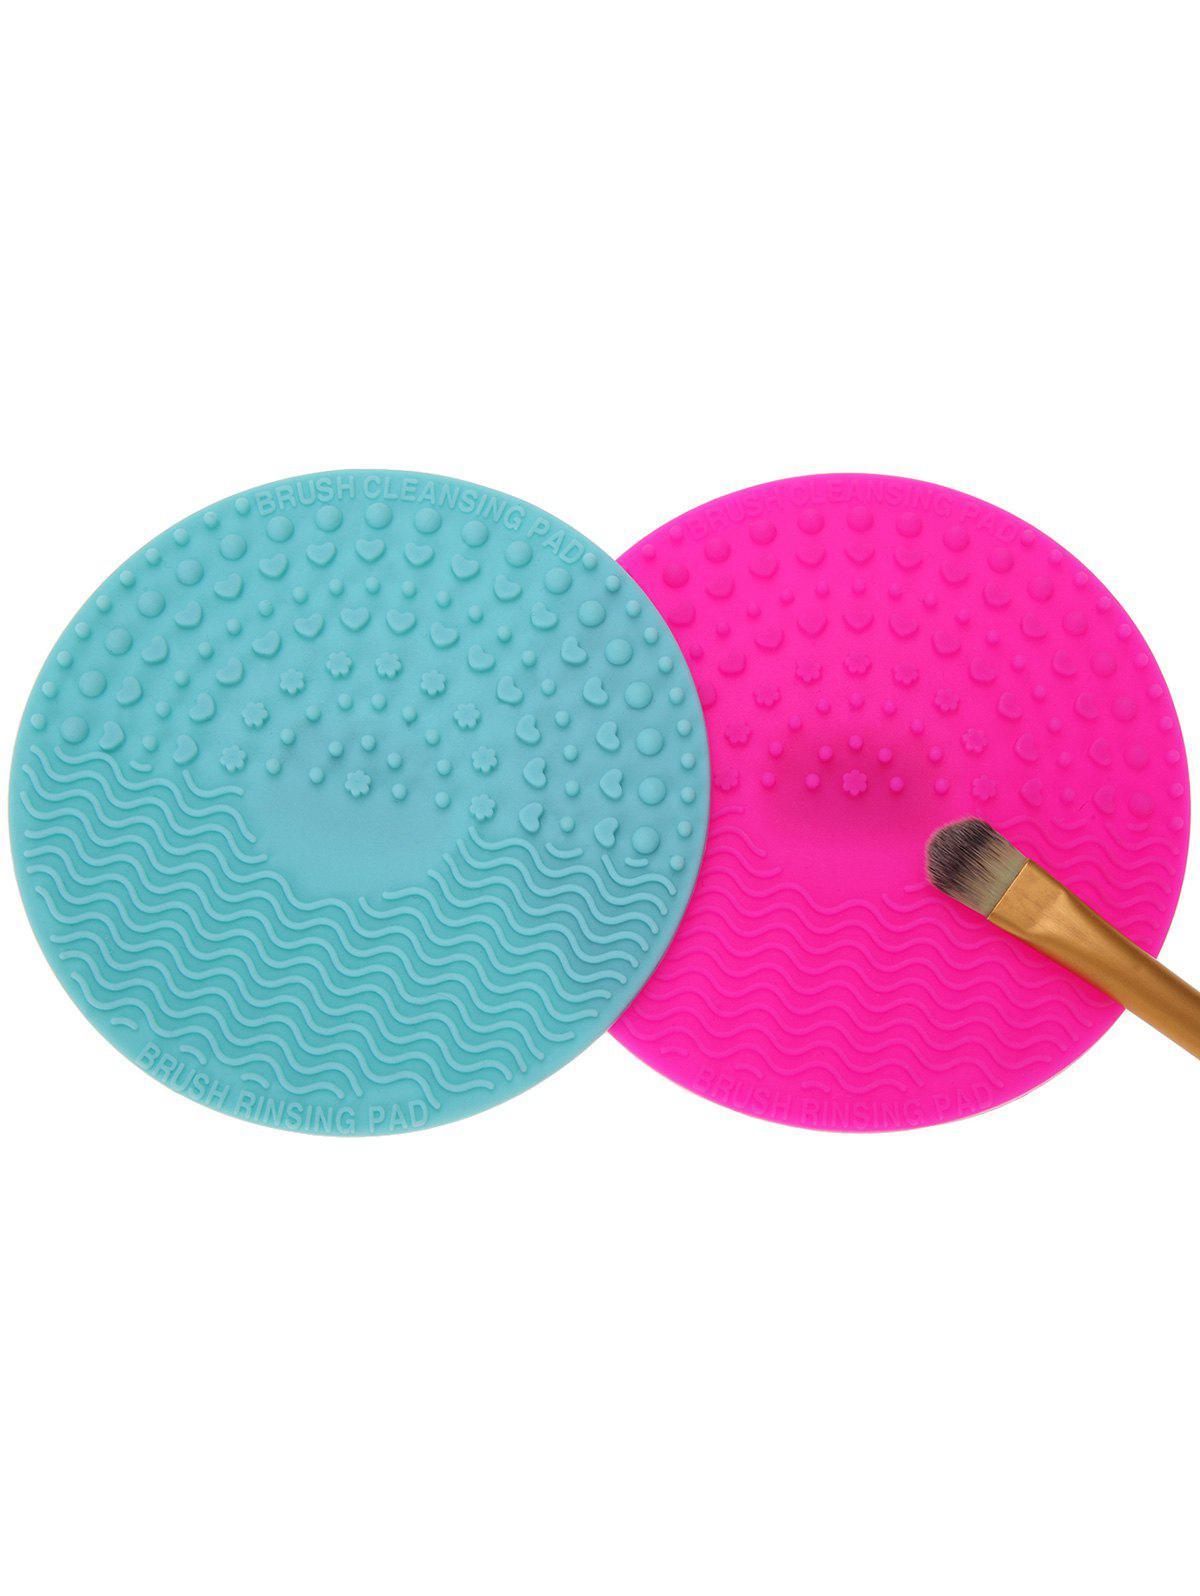 2 Pcs Makeup Brush Cleaning Pads